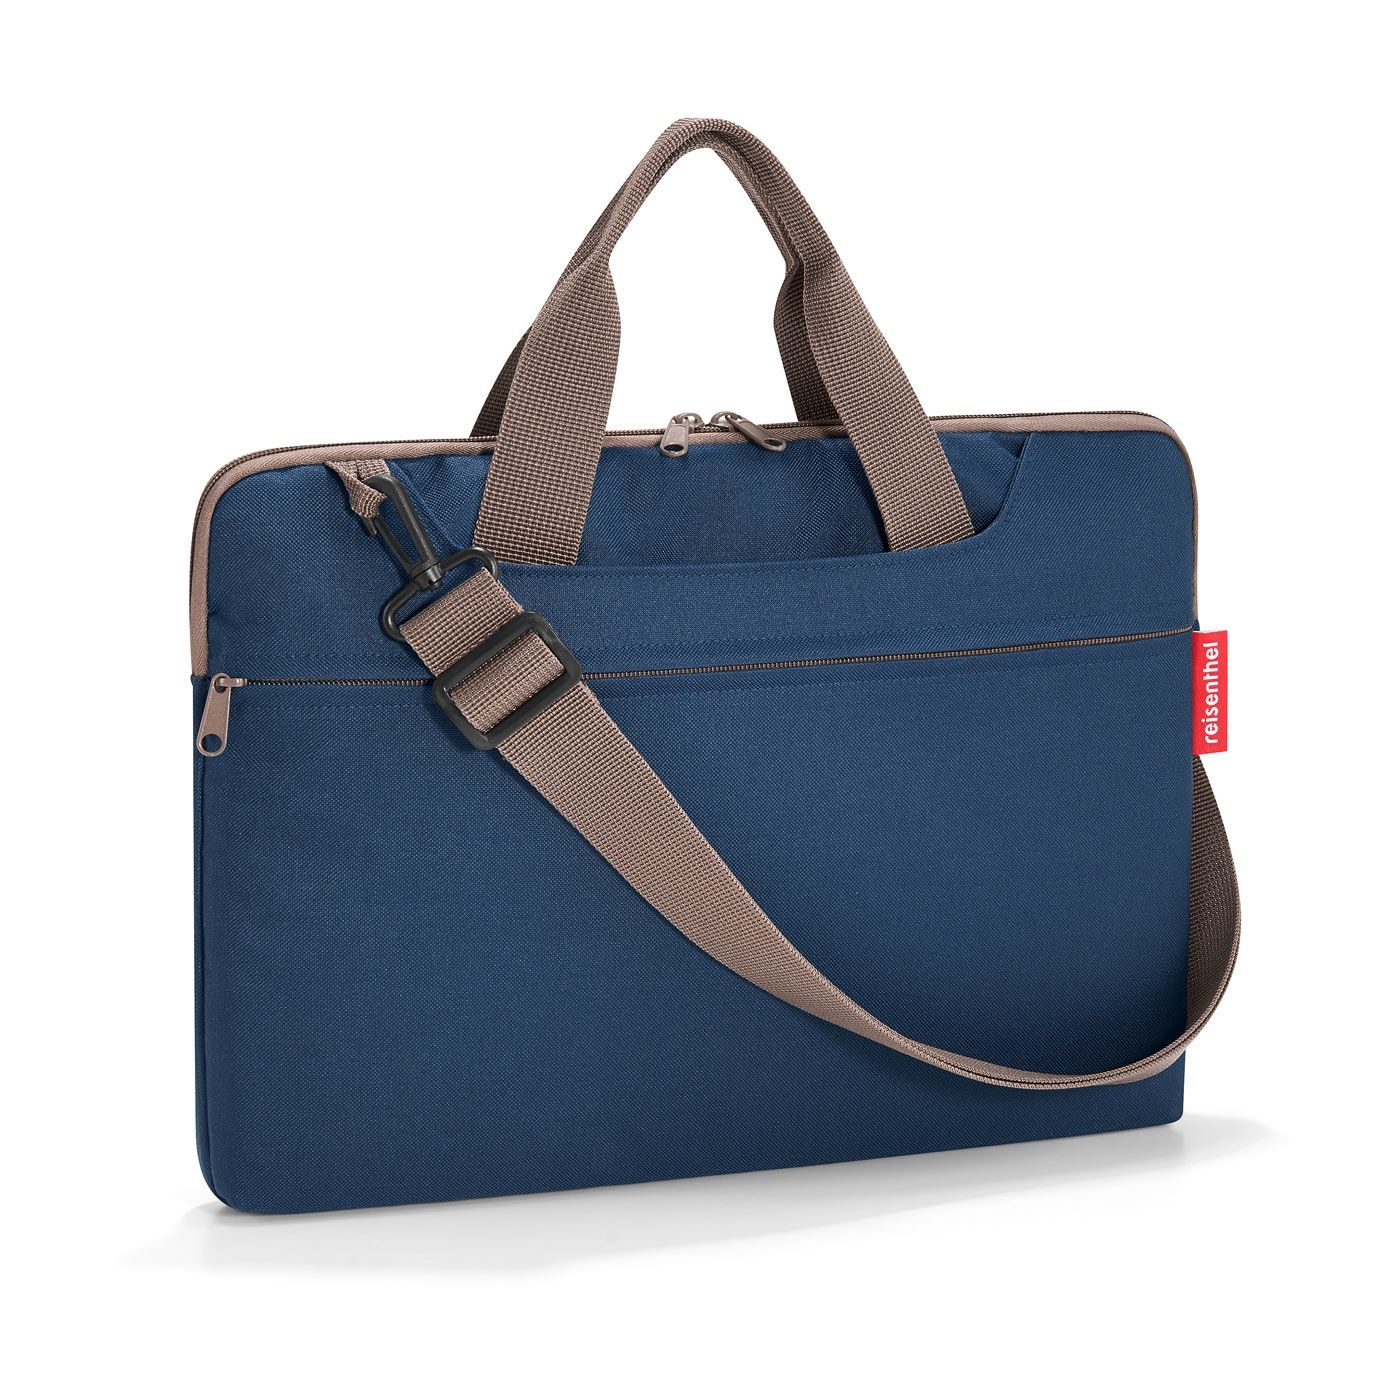 Reisenthel Netbookbag Dark Blue